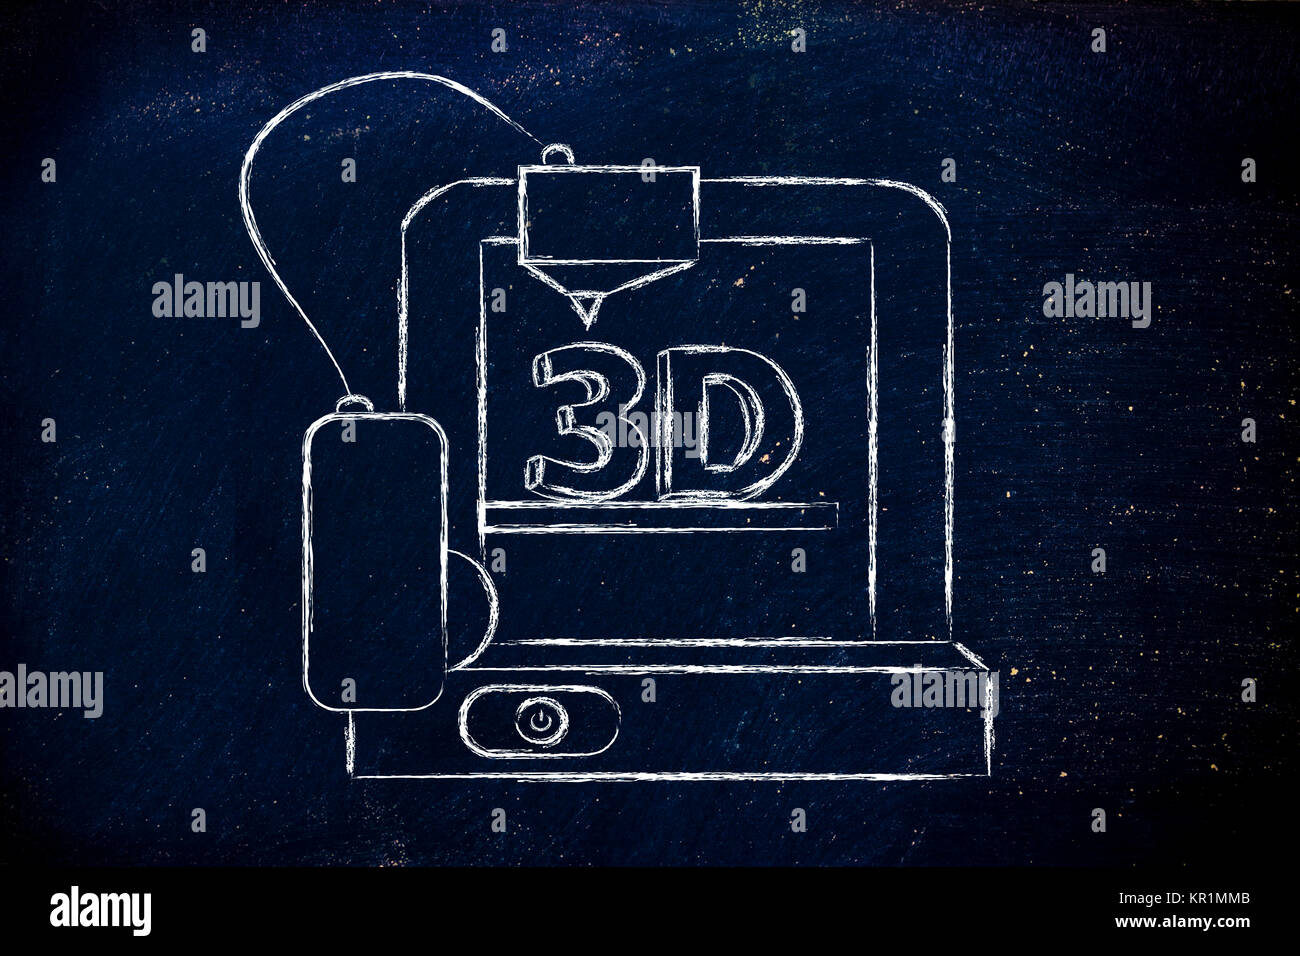 3D printer, information technology hardware innovations - Stock Image